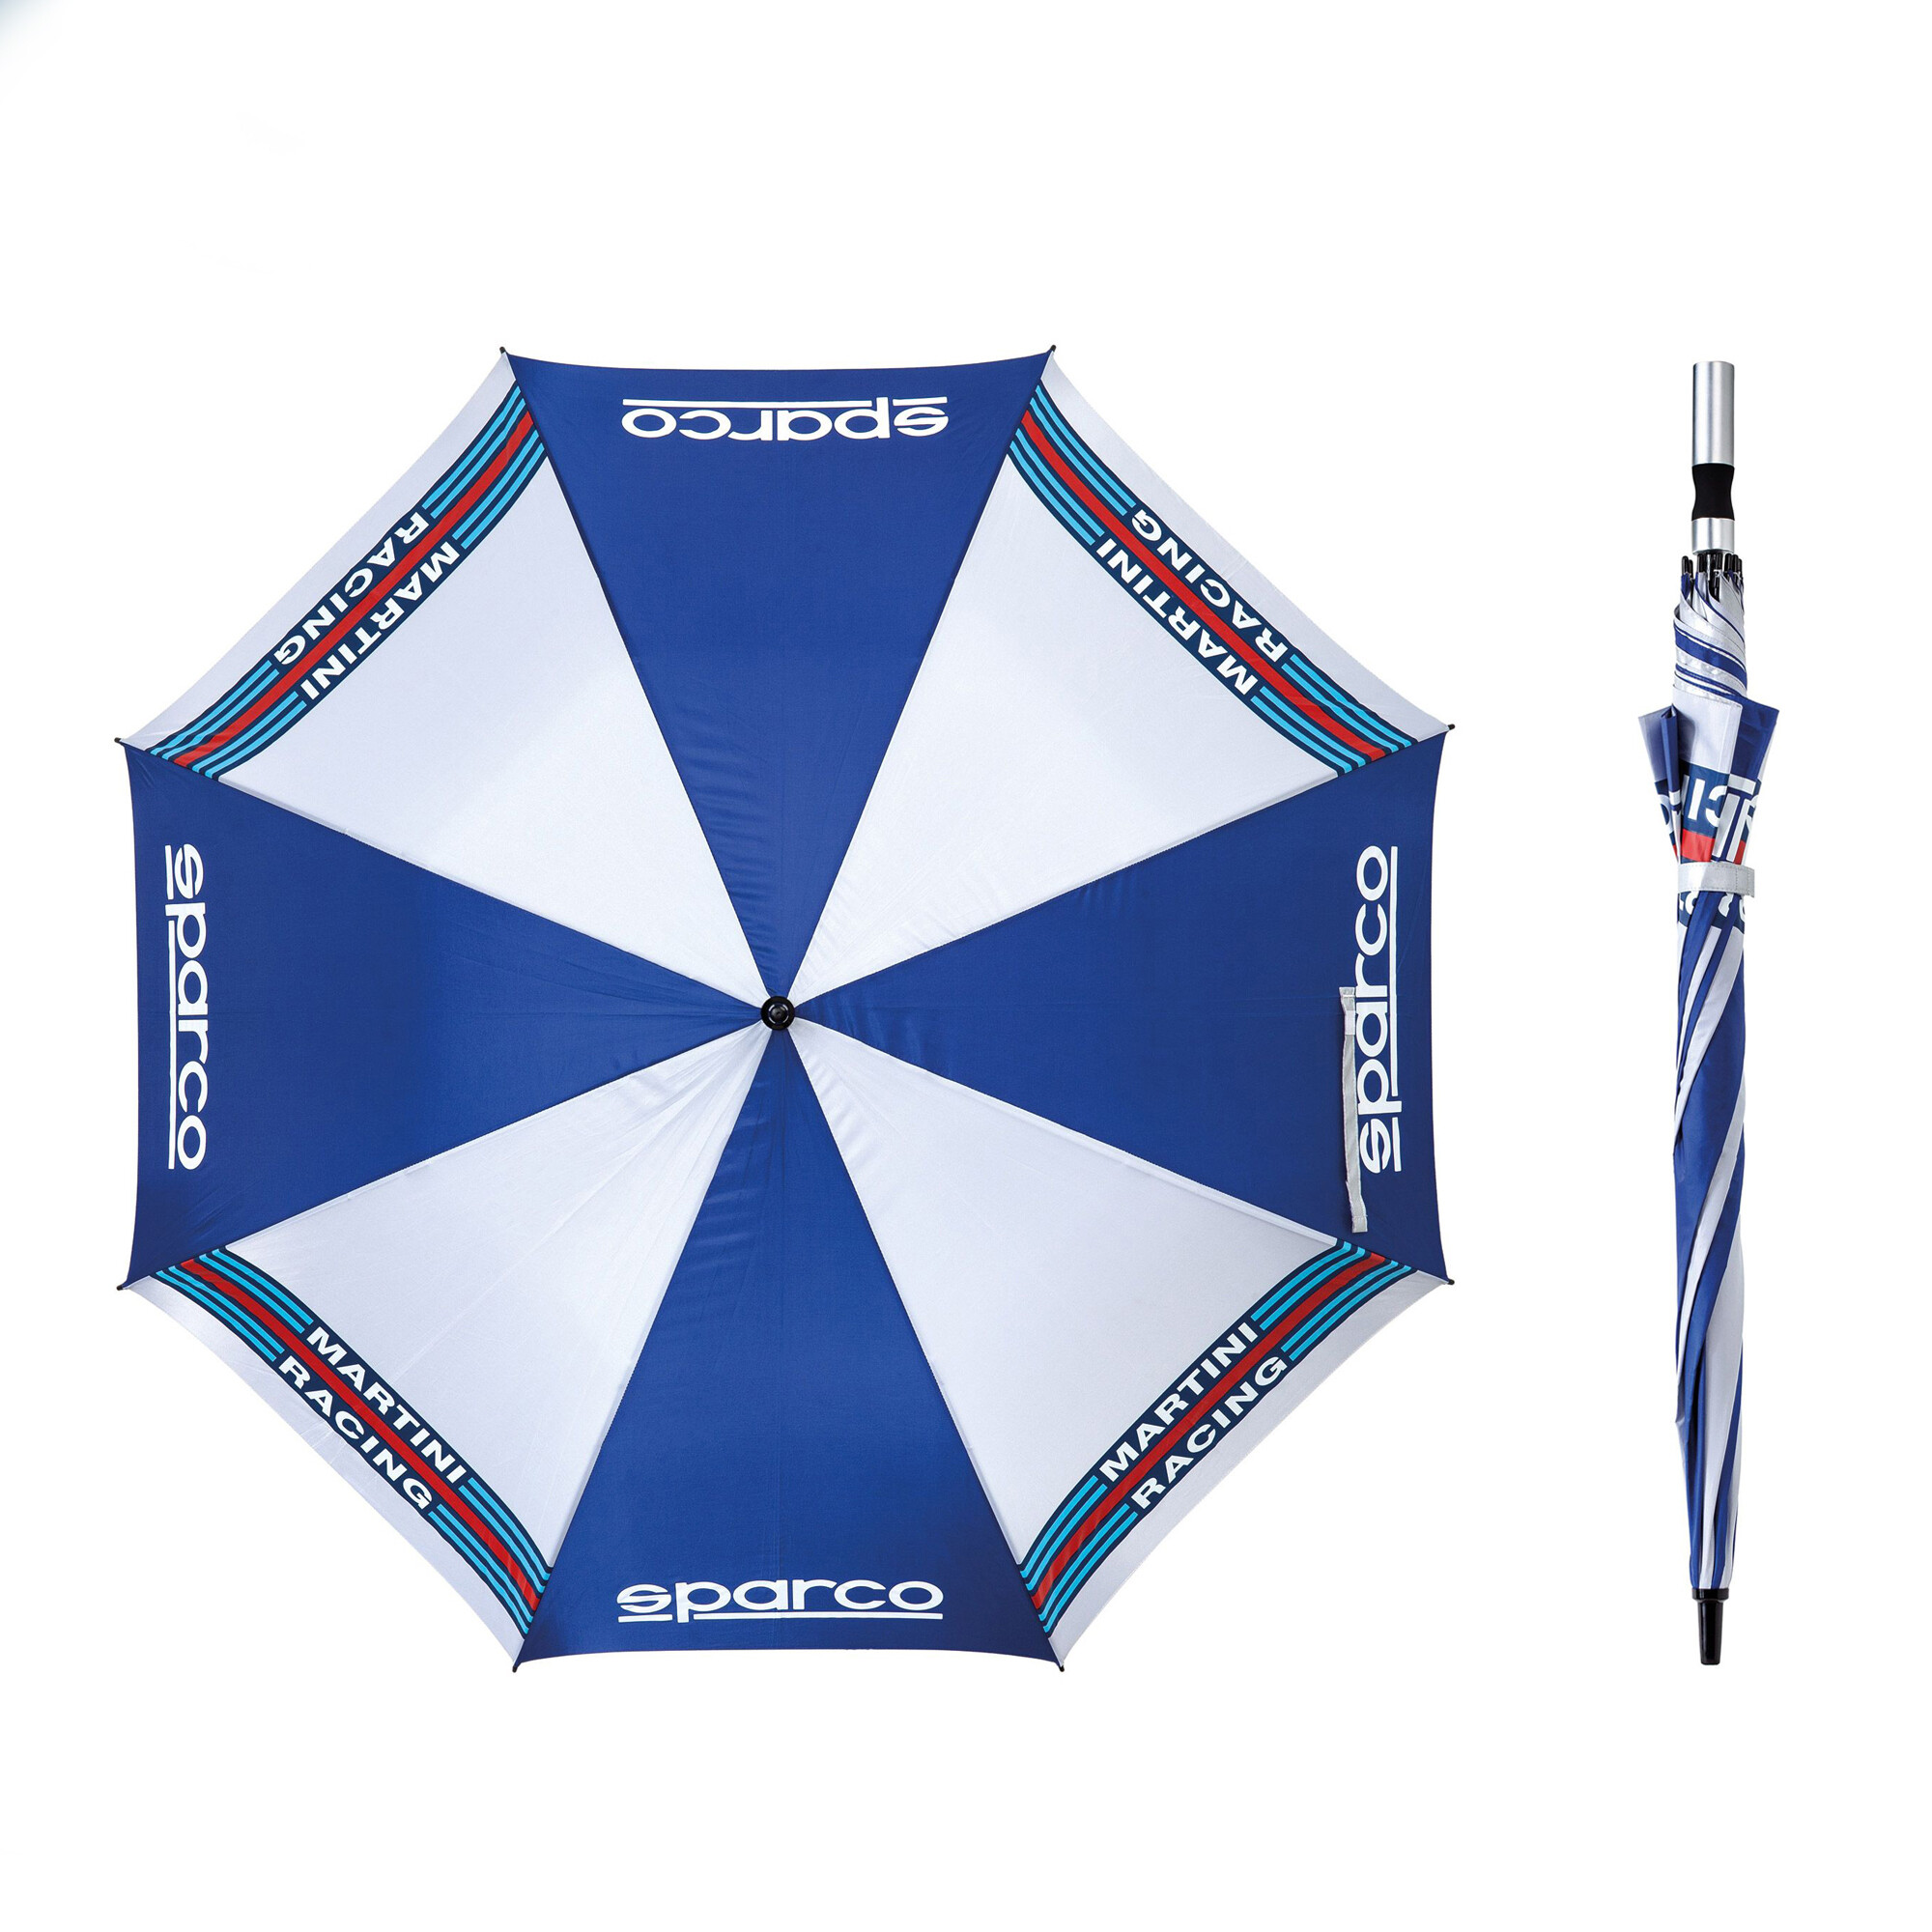 Sparco Umbrella Martini Racing